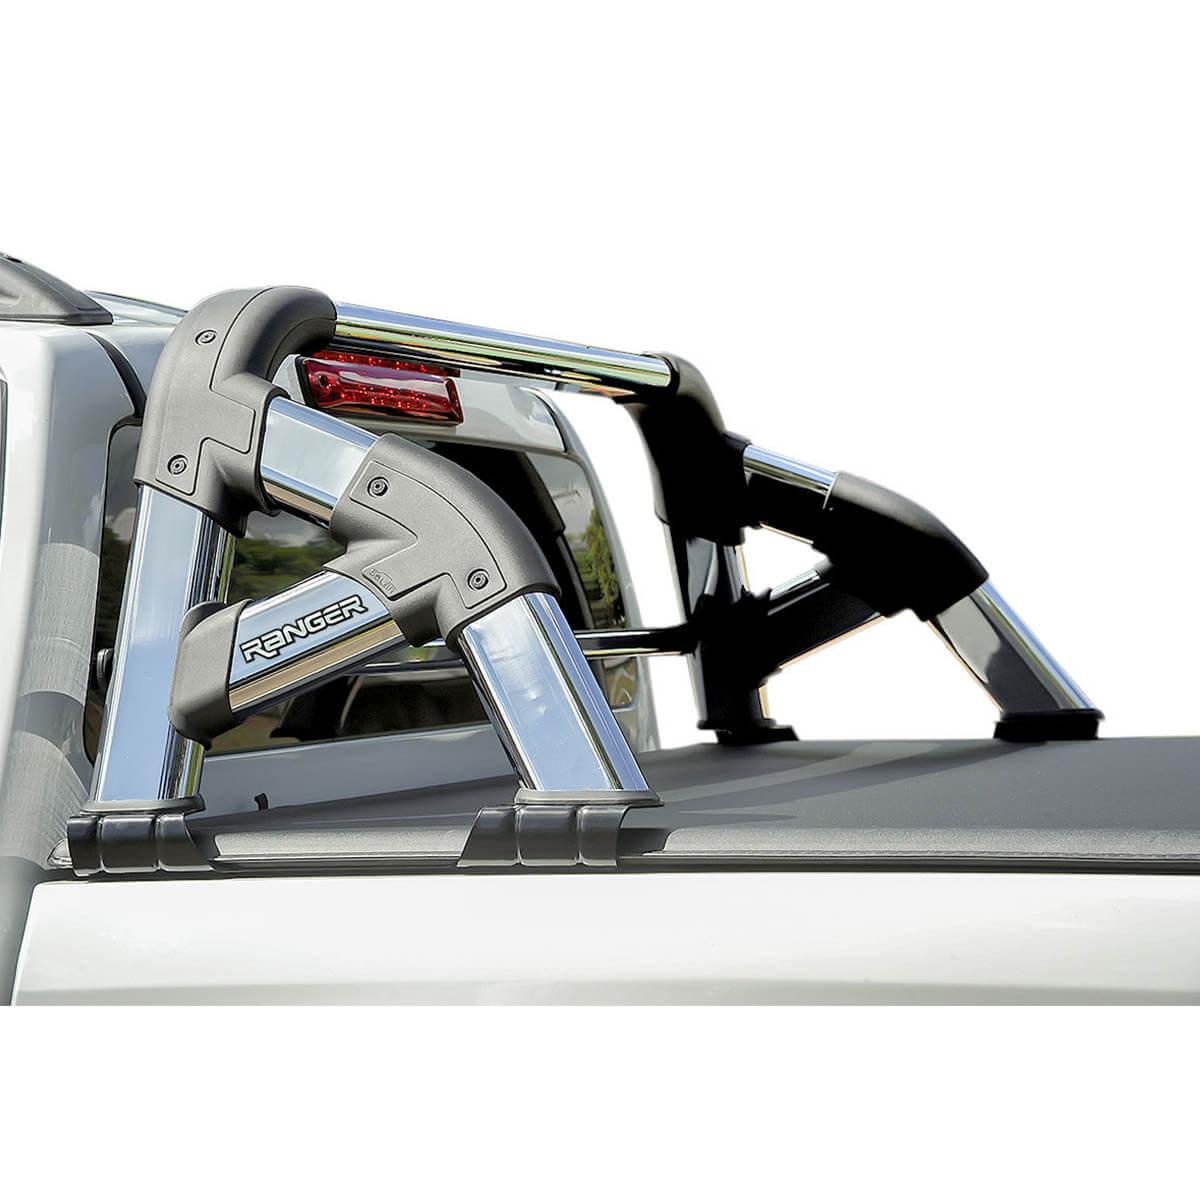 Santo antônio cromado Solar Exclusive Ranger 1994 a 2012 com barra de vidro cromada